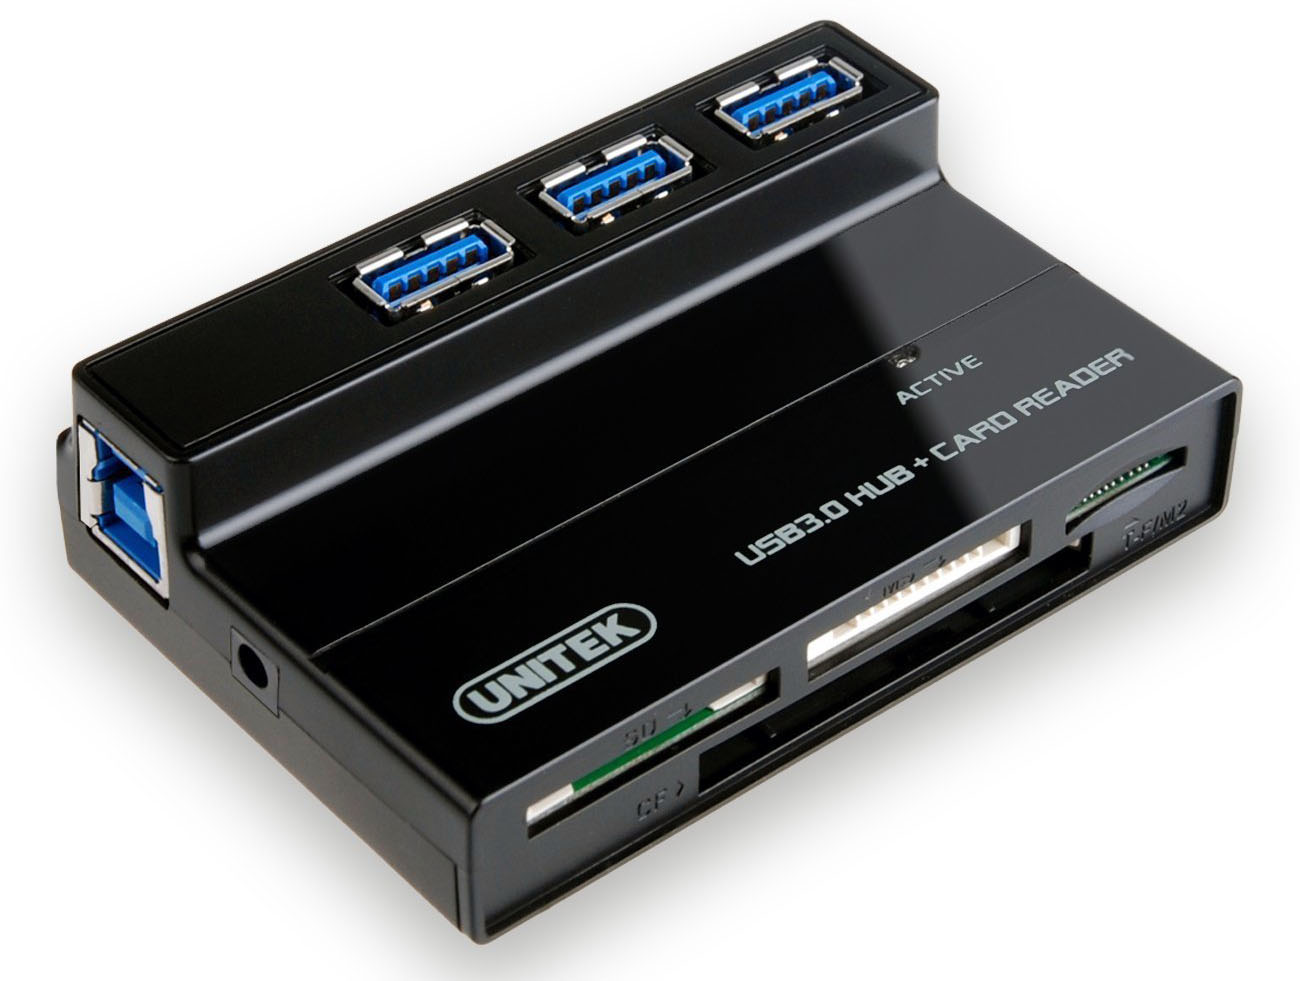 Review Unitek 3 Port Usb 3 0 Hub With Card Reader